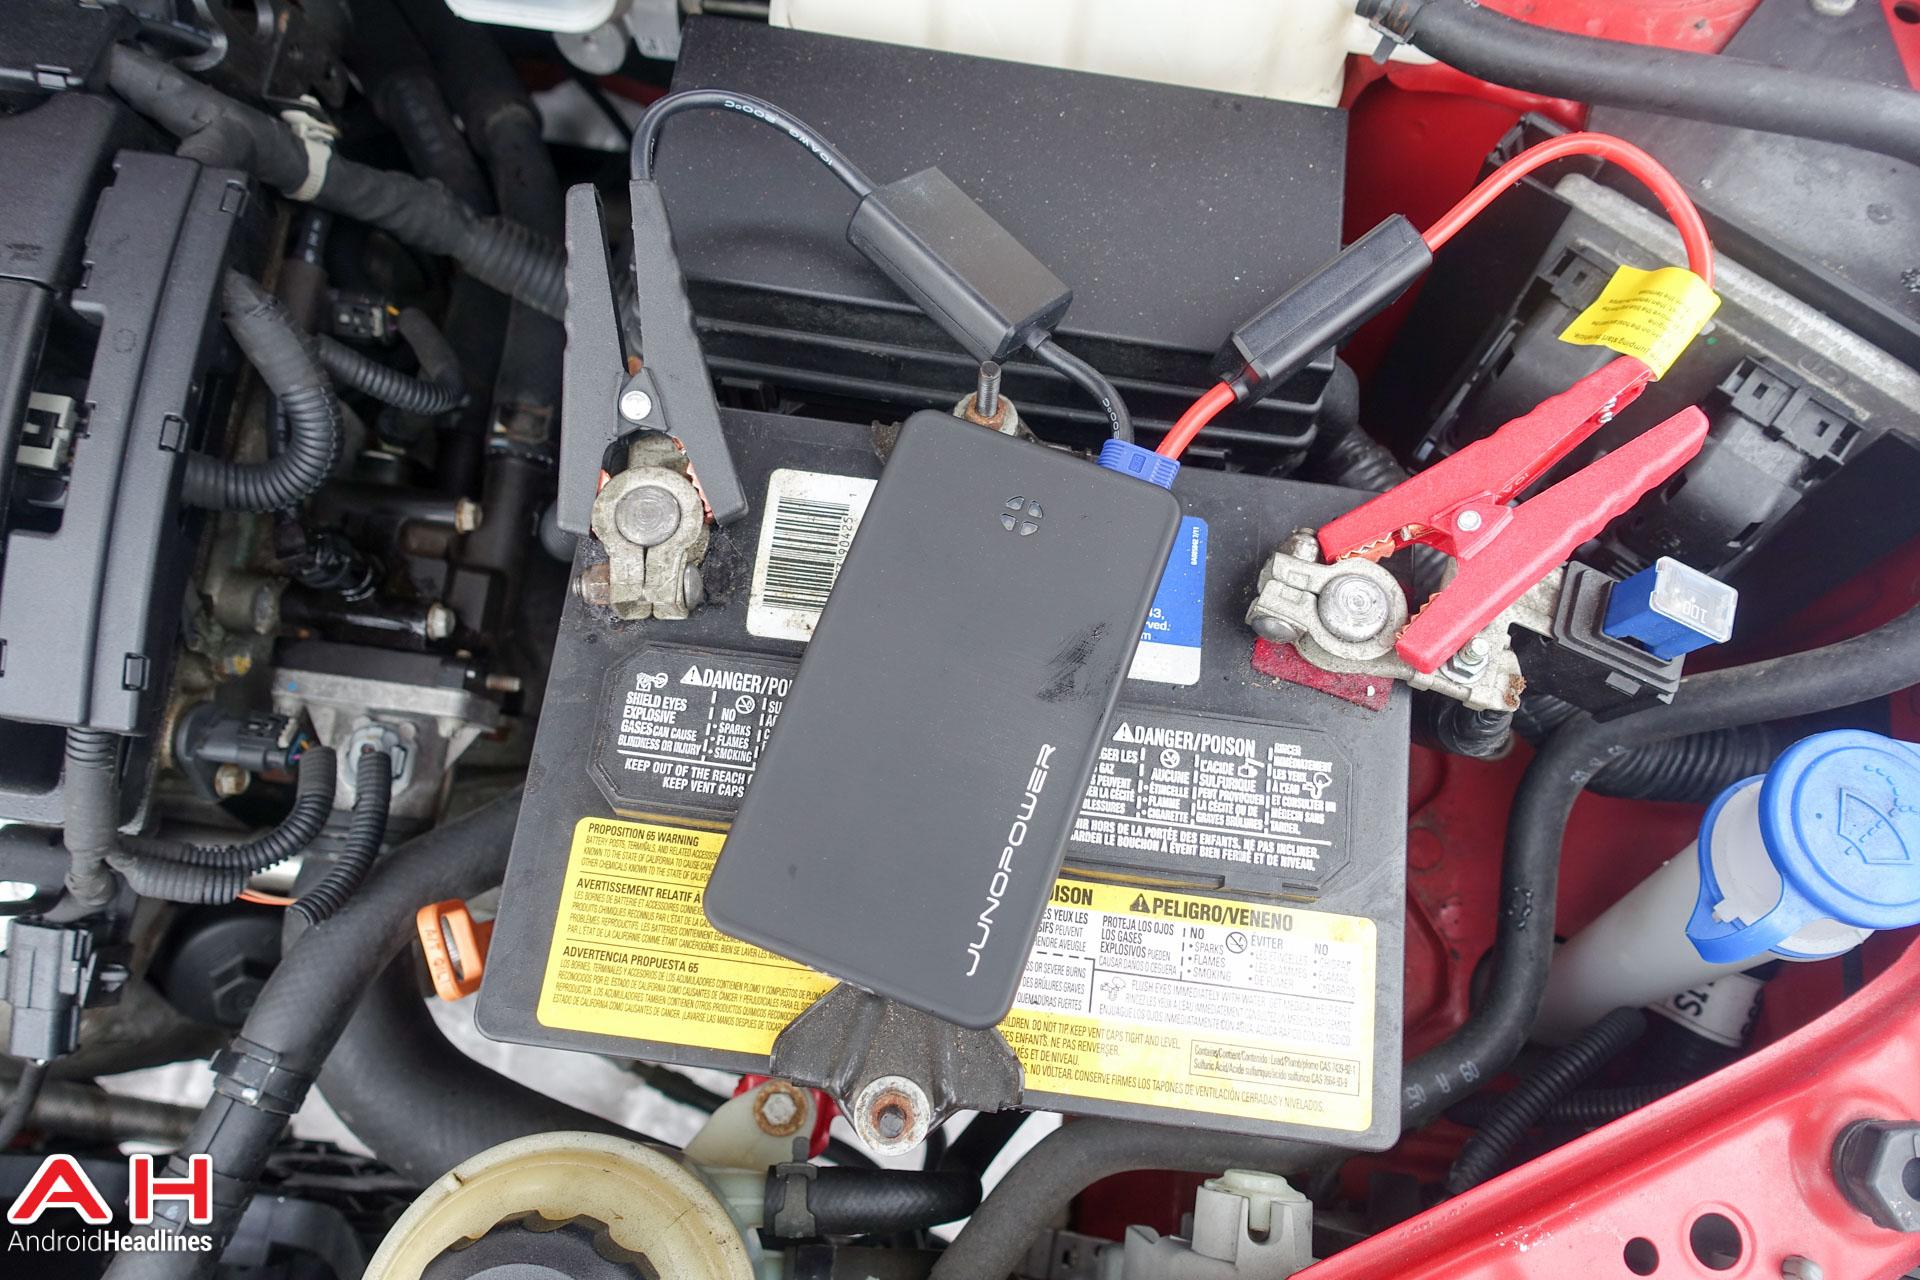 Junopower-Battery-Pack-AH-03527